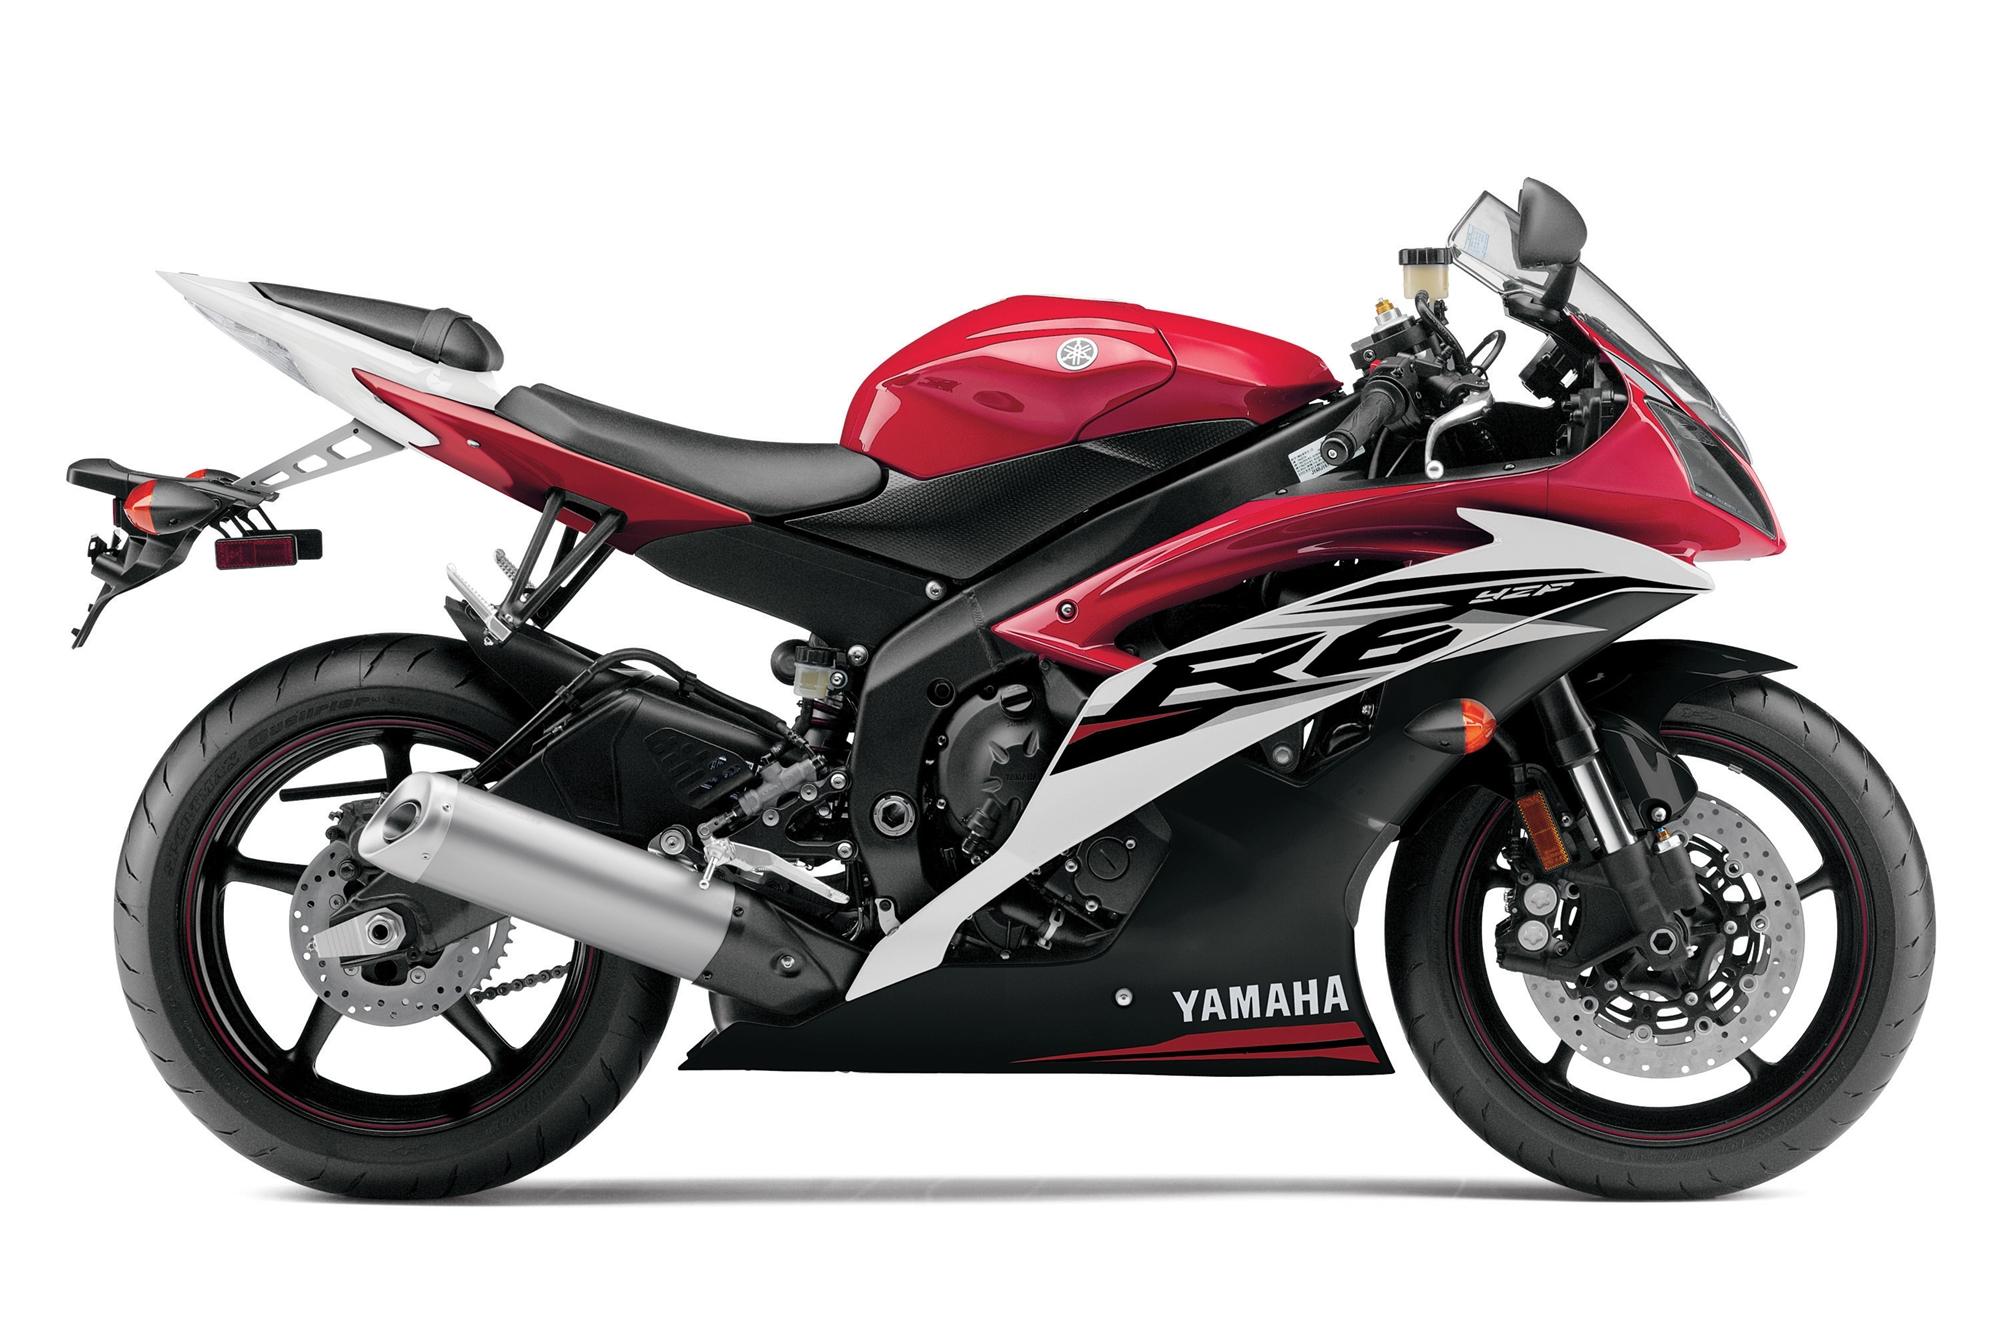 2014 yamaha yzf r6 official pics autoevolution - Image moto sportive ...